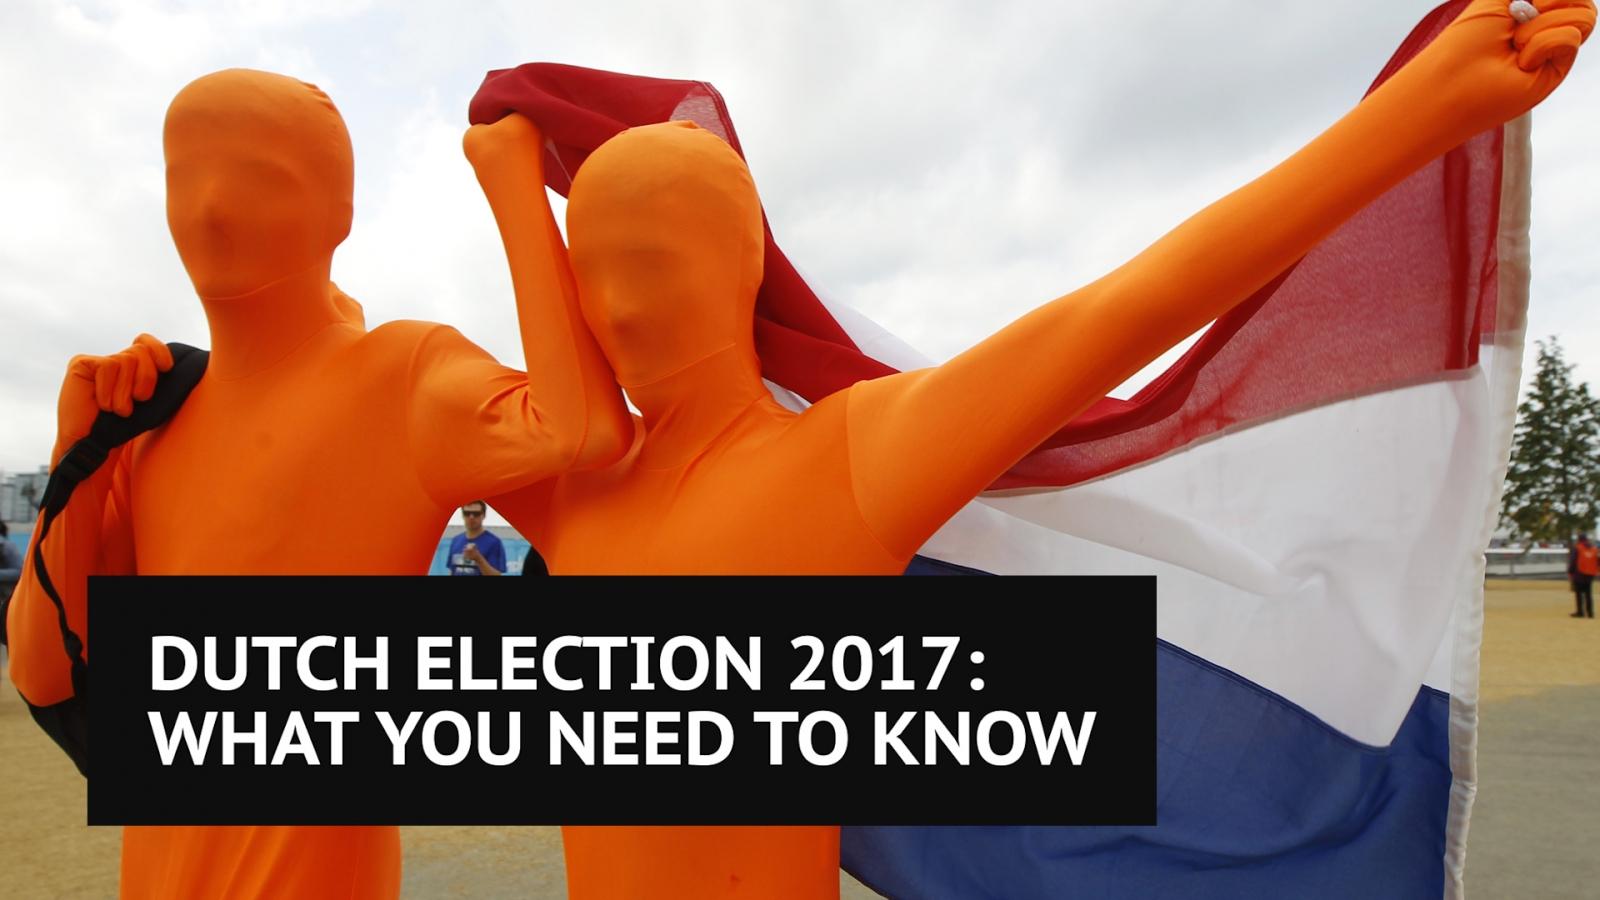 Dutch election 2017